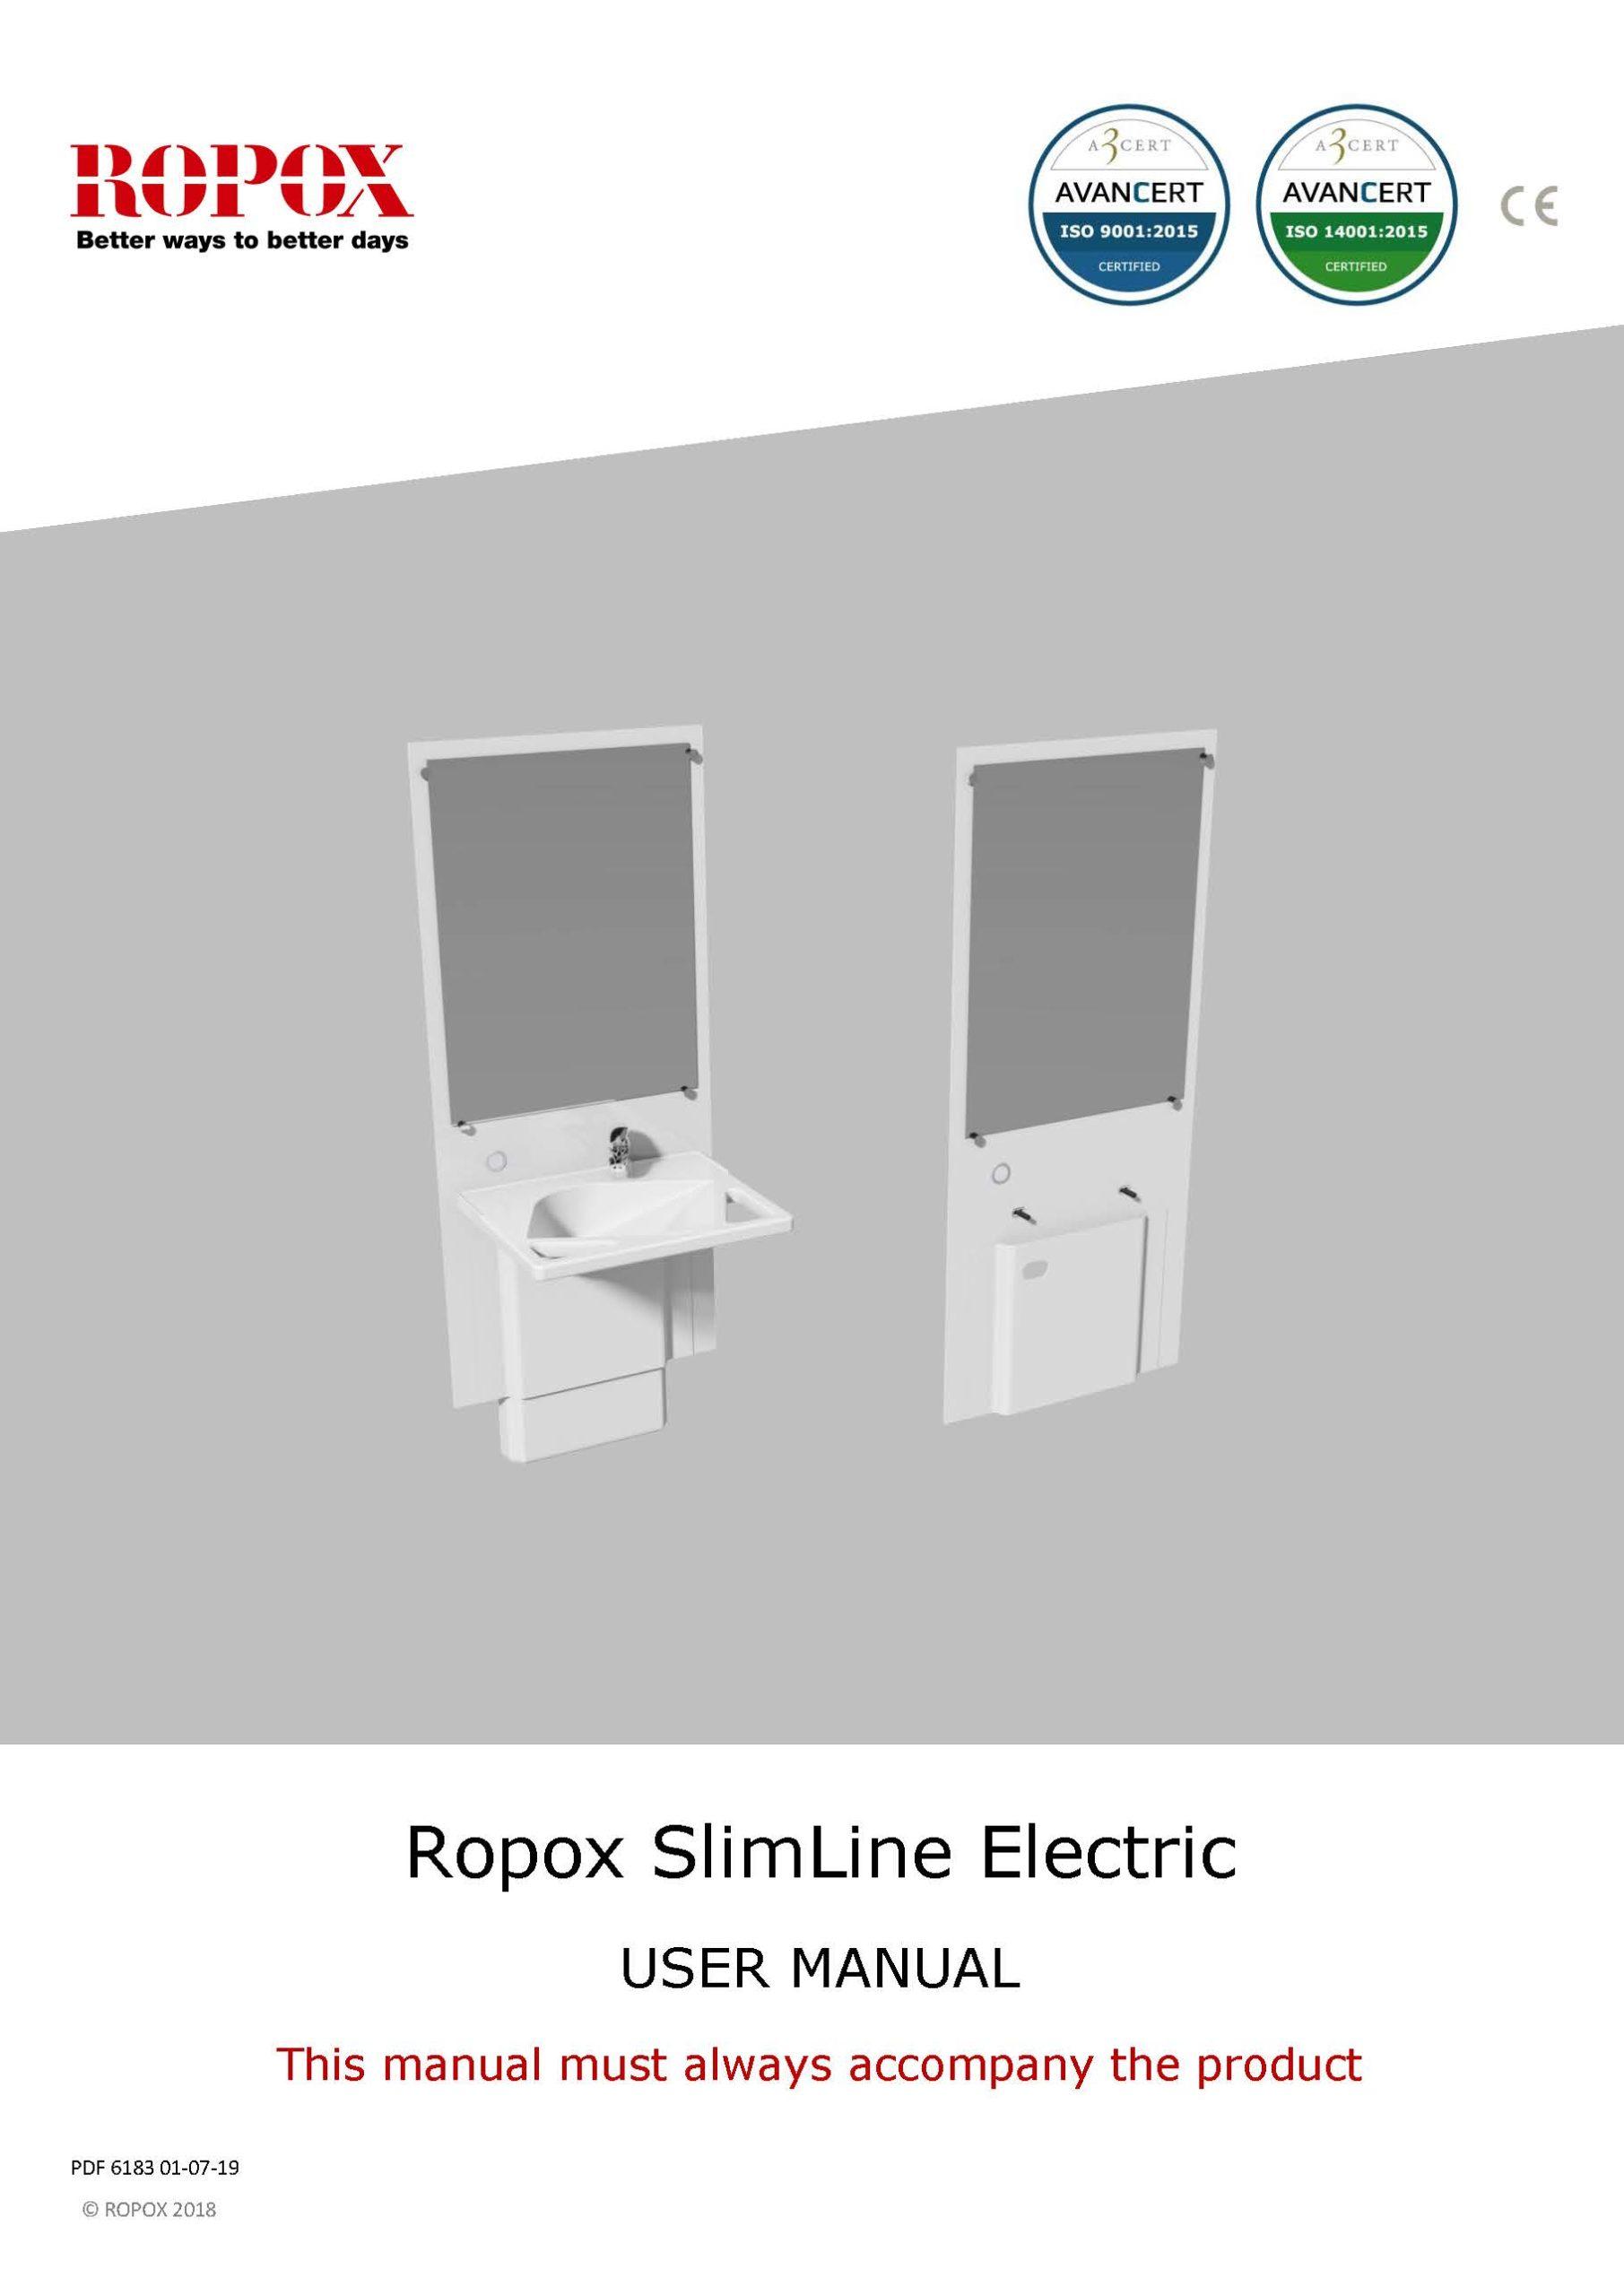 Ropox SlimLine Electric